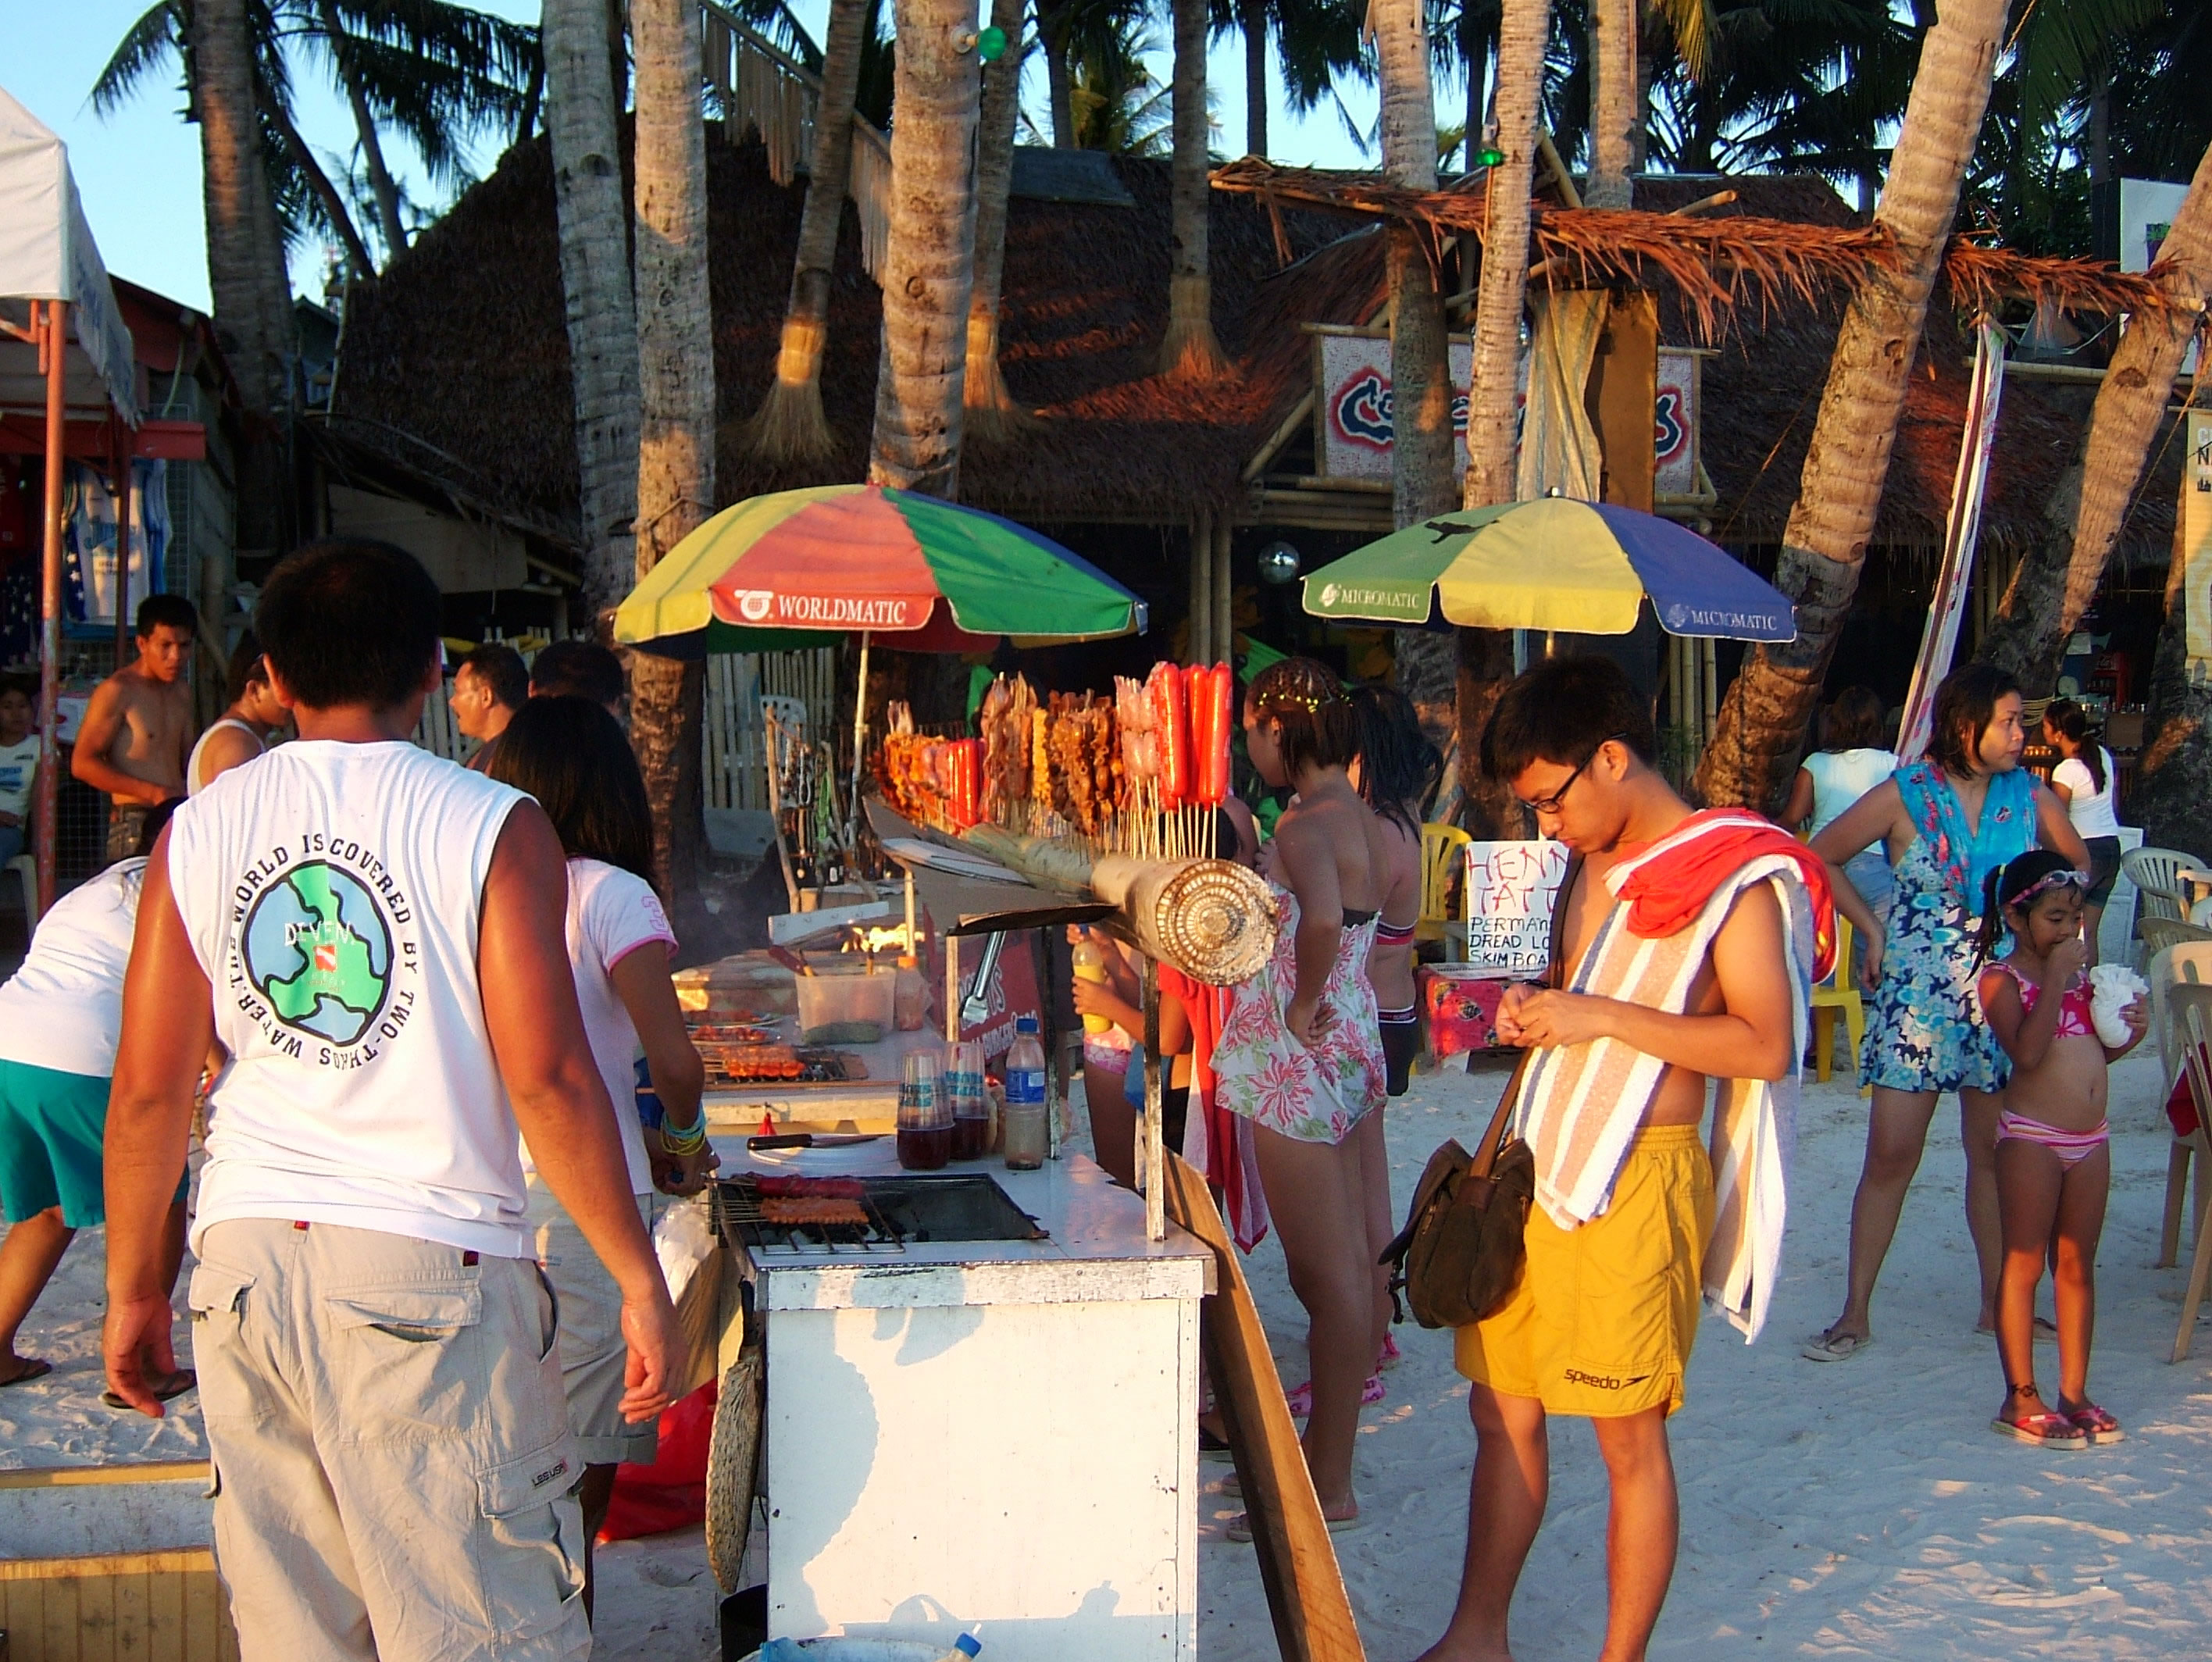 Philippines Sugar Islands Caticlan Boracay White Beach Sunset May 2007 15